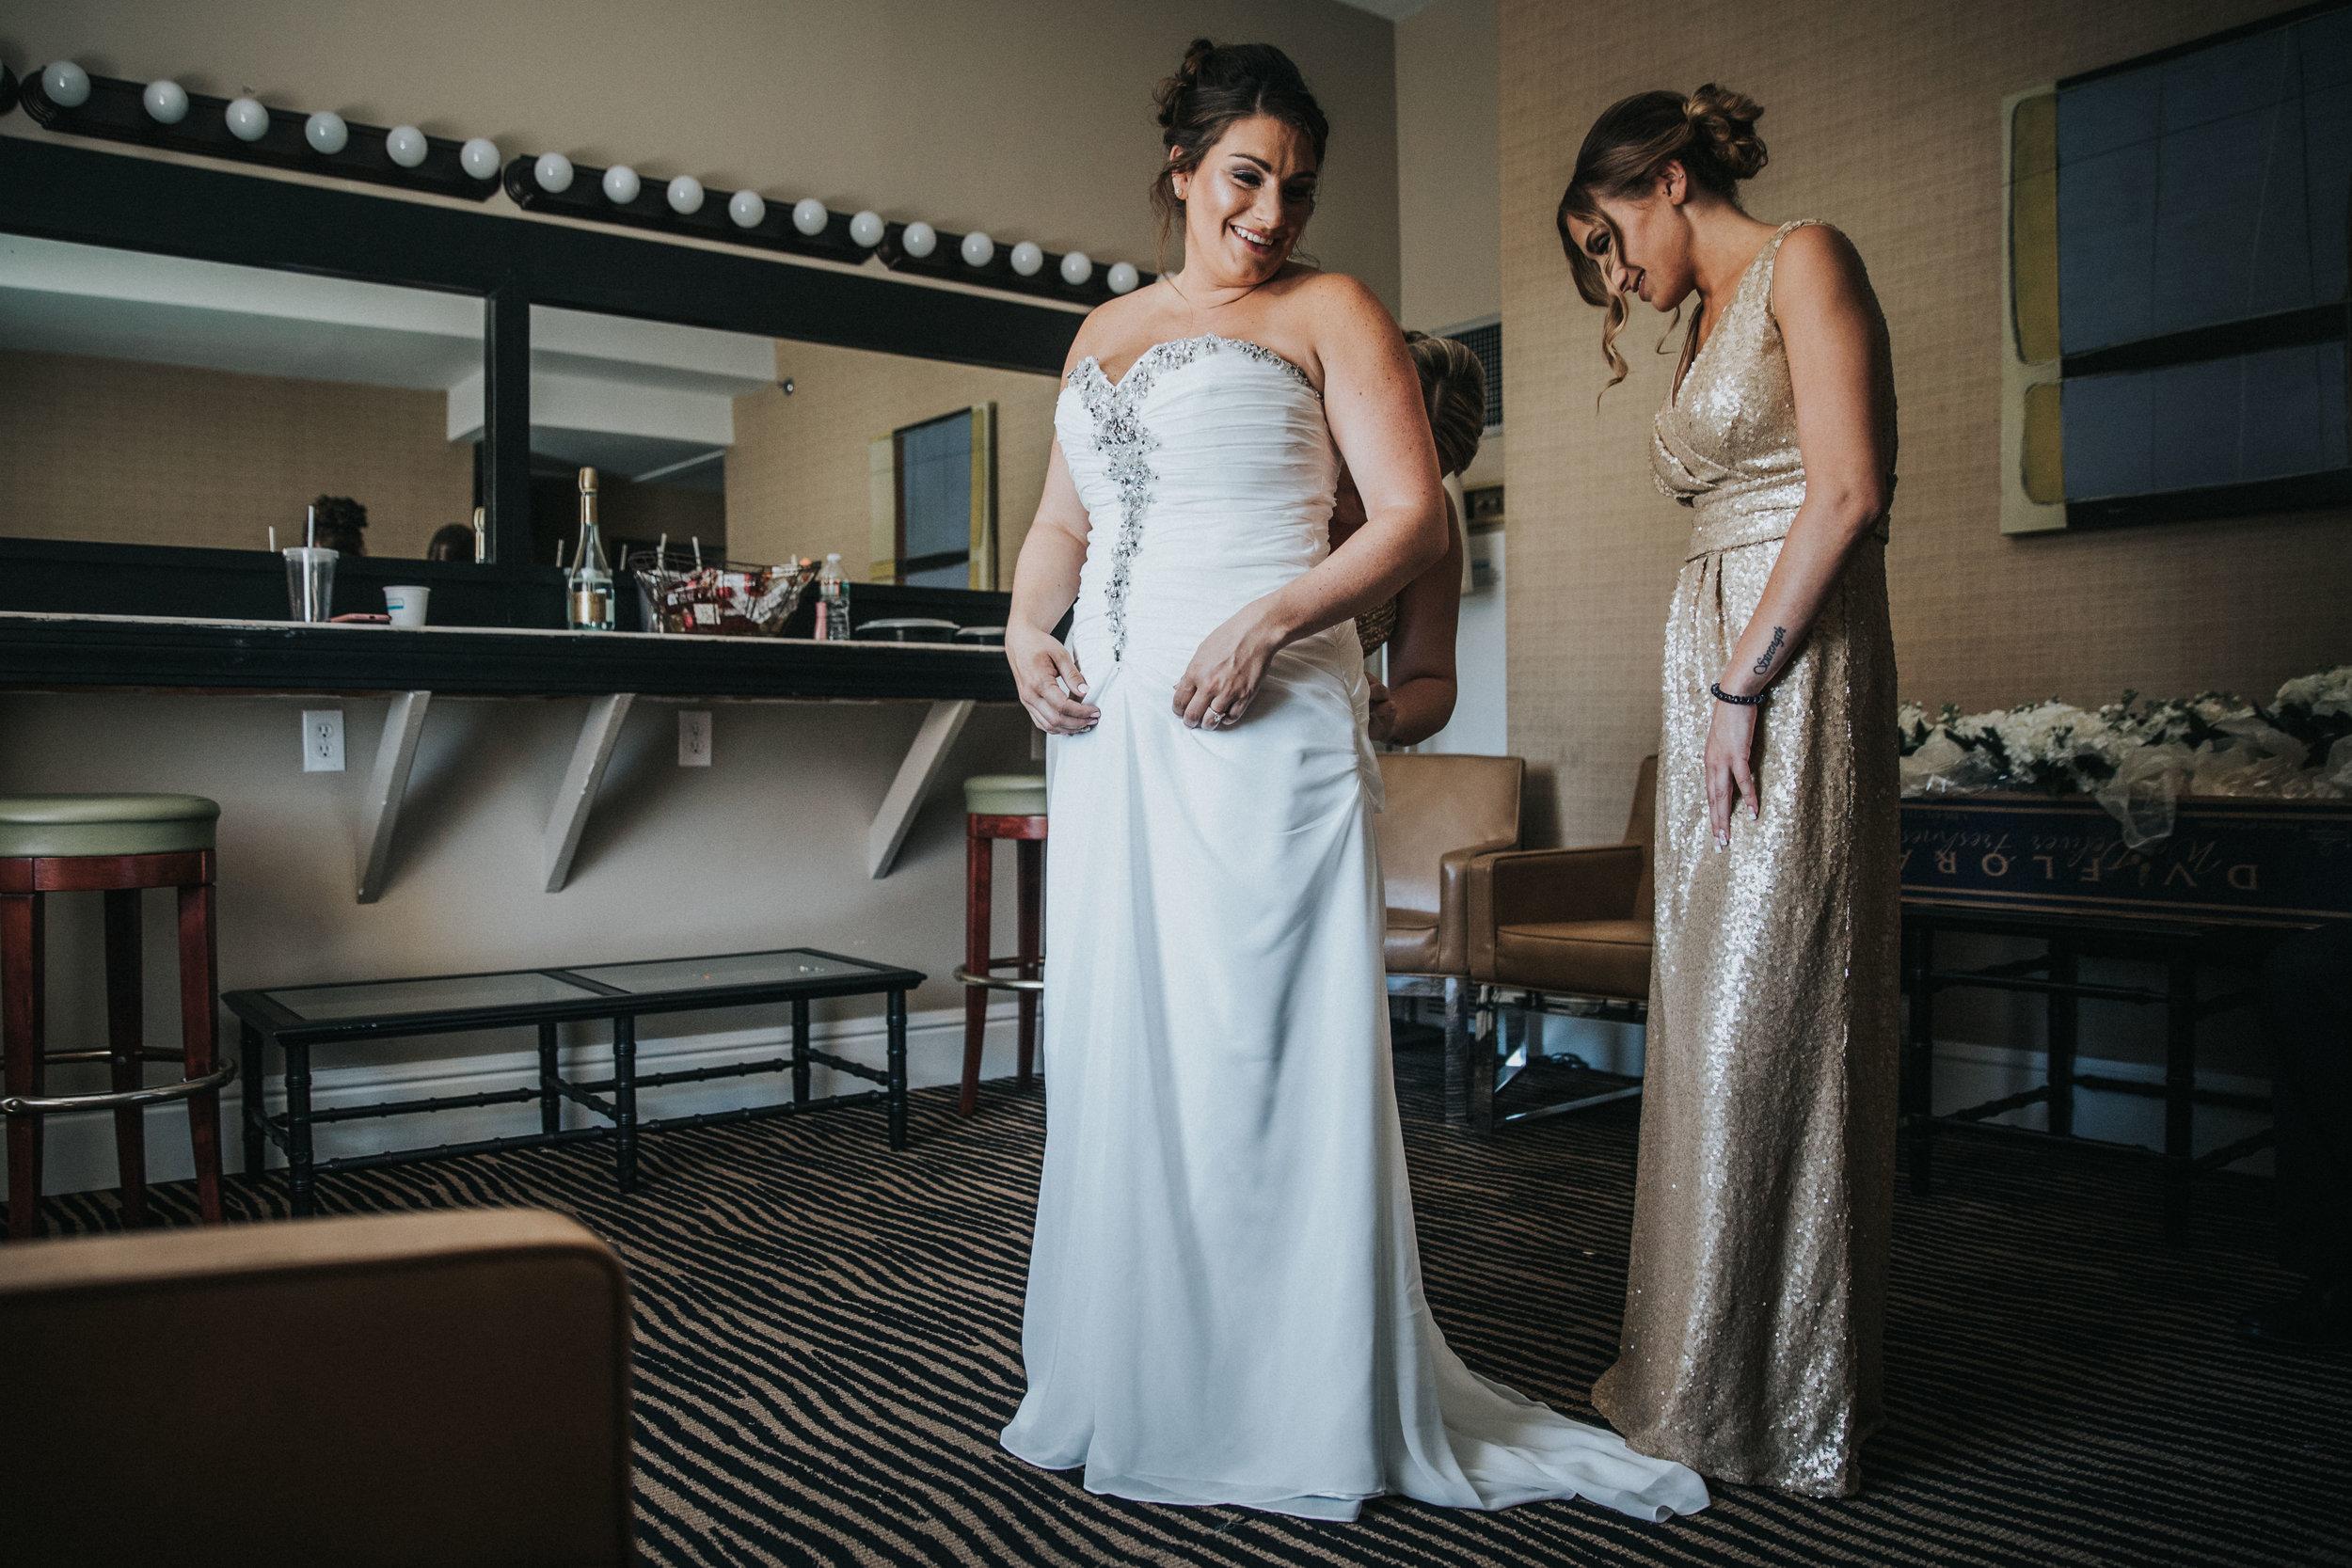 JennaLynnPhotography-NJWeddingPhotographer-Wedding-TheBerkeley-AsburyPark-Allison&Michael-GettingReady-76.jpg